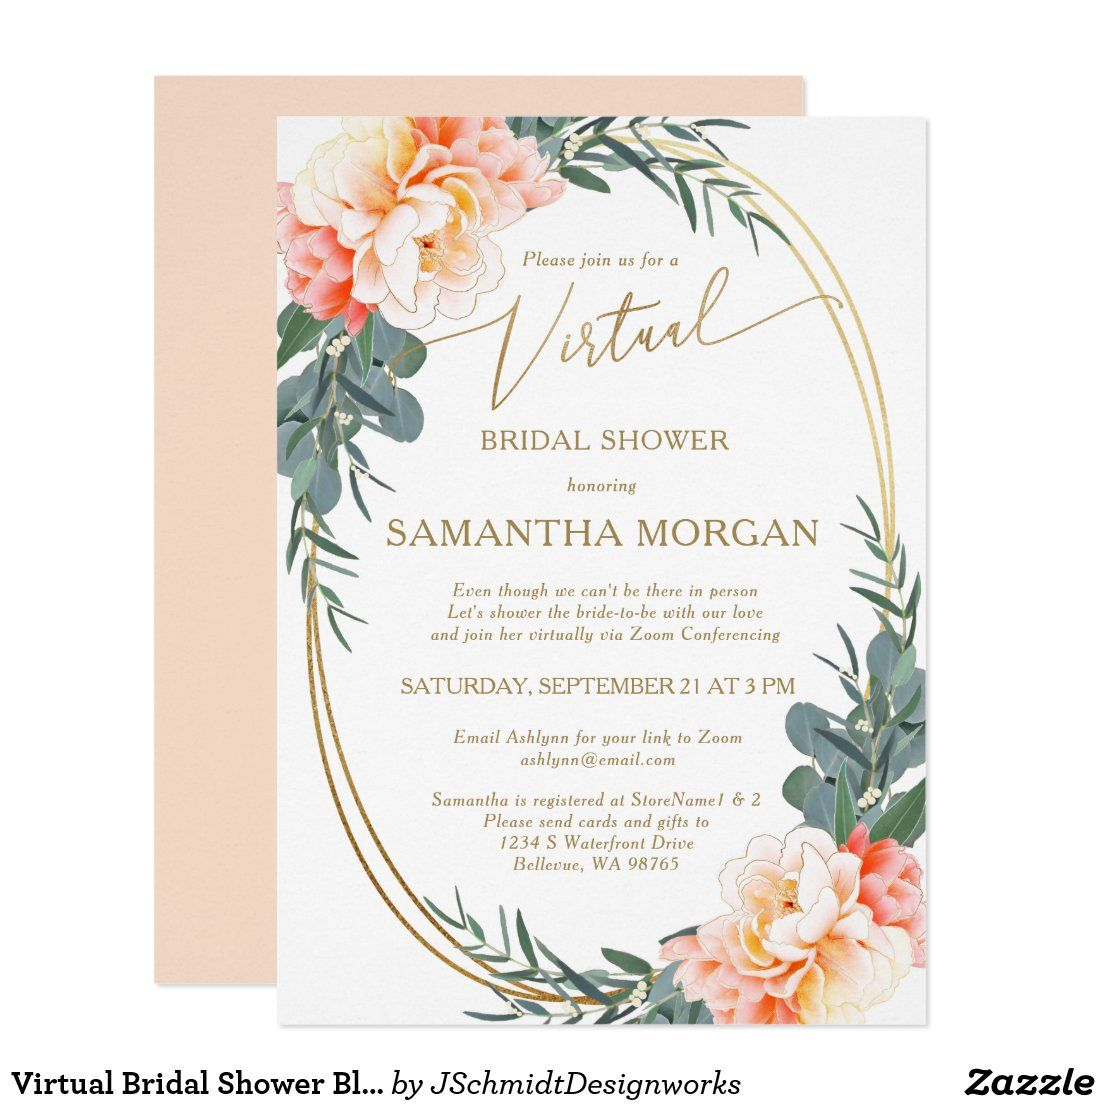 Virtual Bridal Shower Blush Peach Cream Eucalyptus Invitation Zazzle Com In 2020 Bridal Shower Invitations Printable Bridal Shower Invitation Wording Bridal Shower Invitations Printable Free